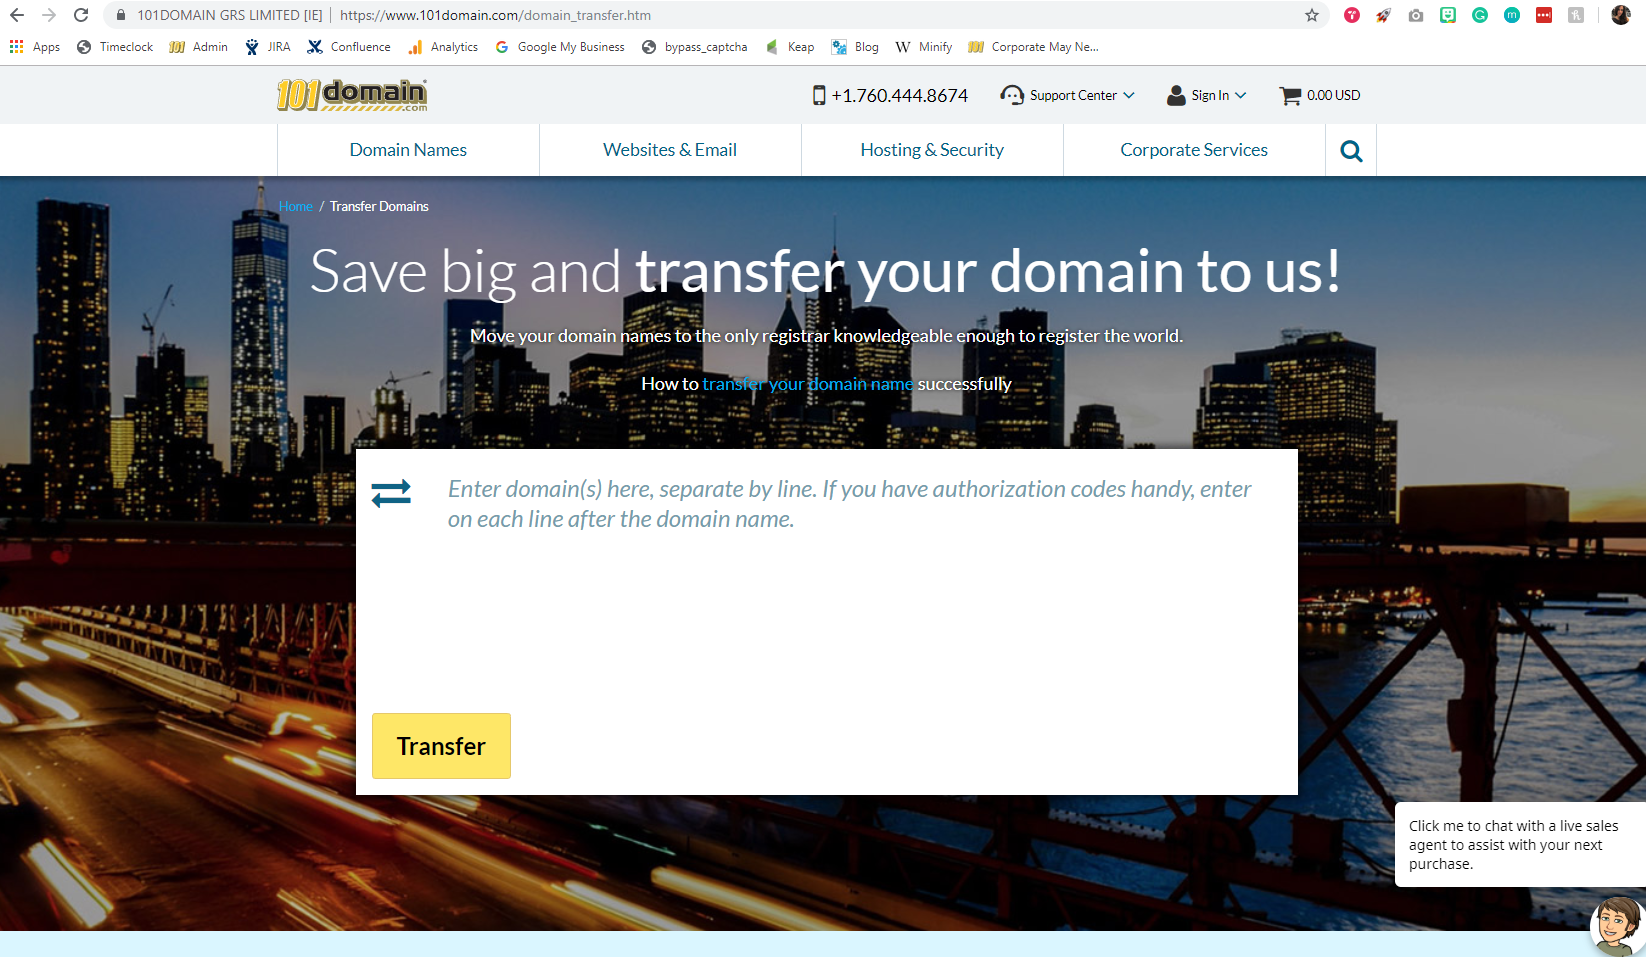 101domain domain transfers